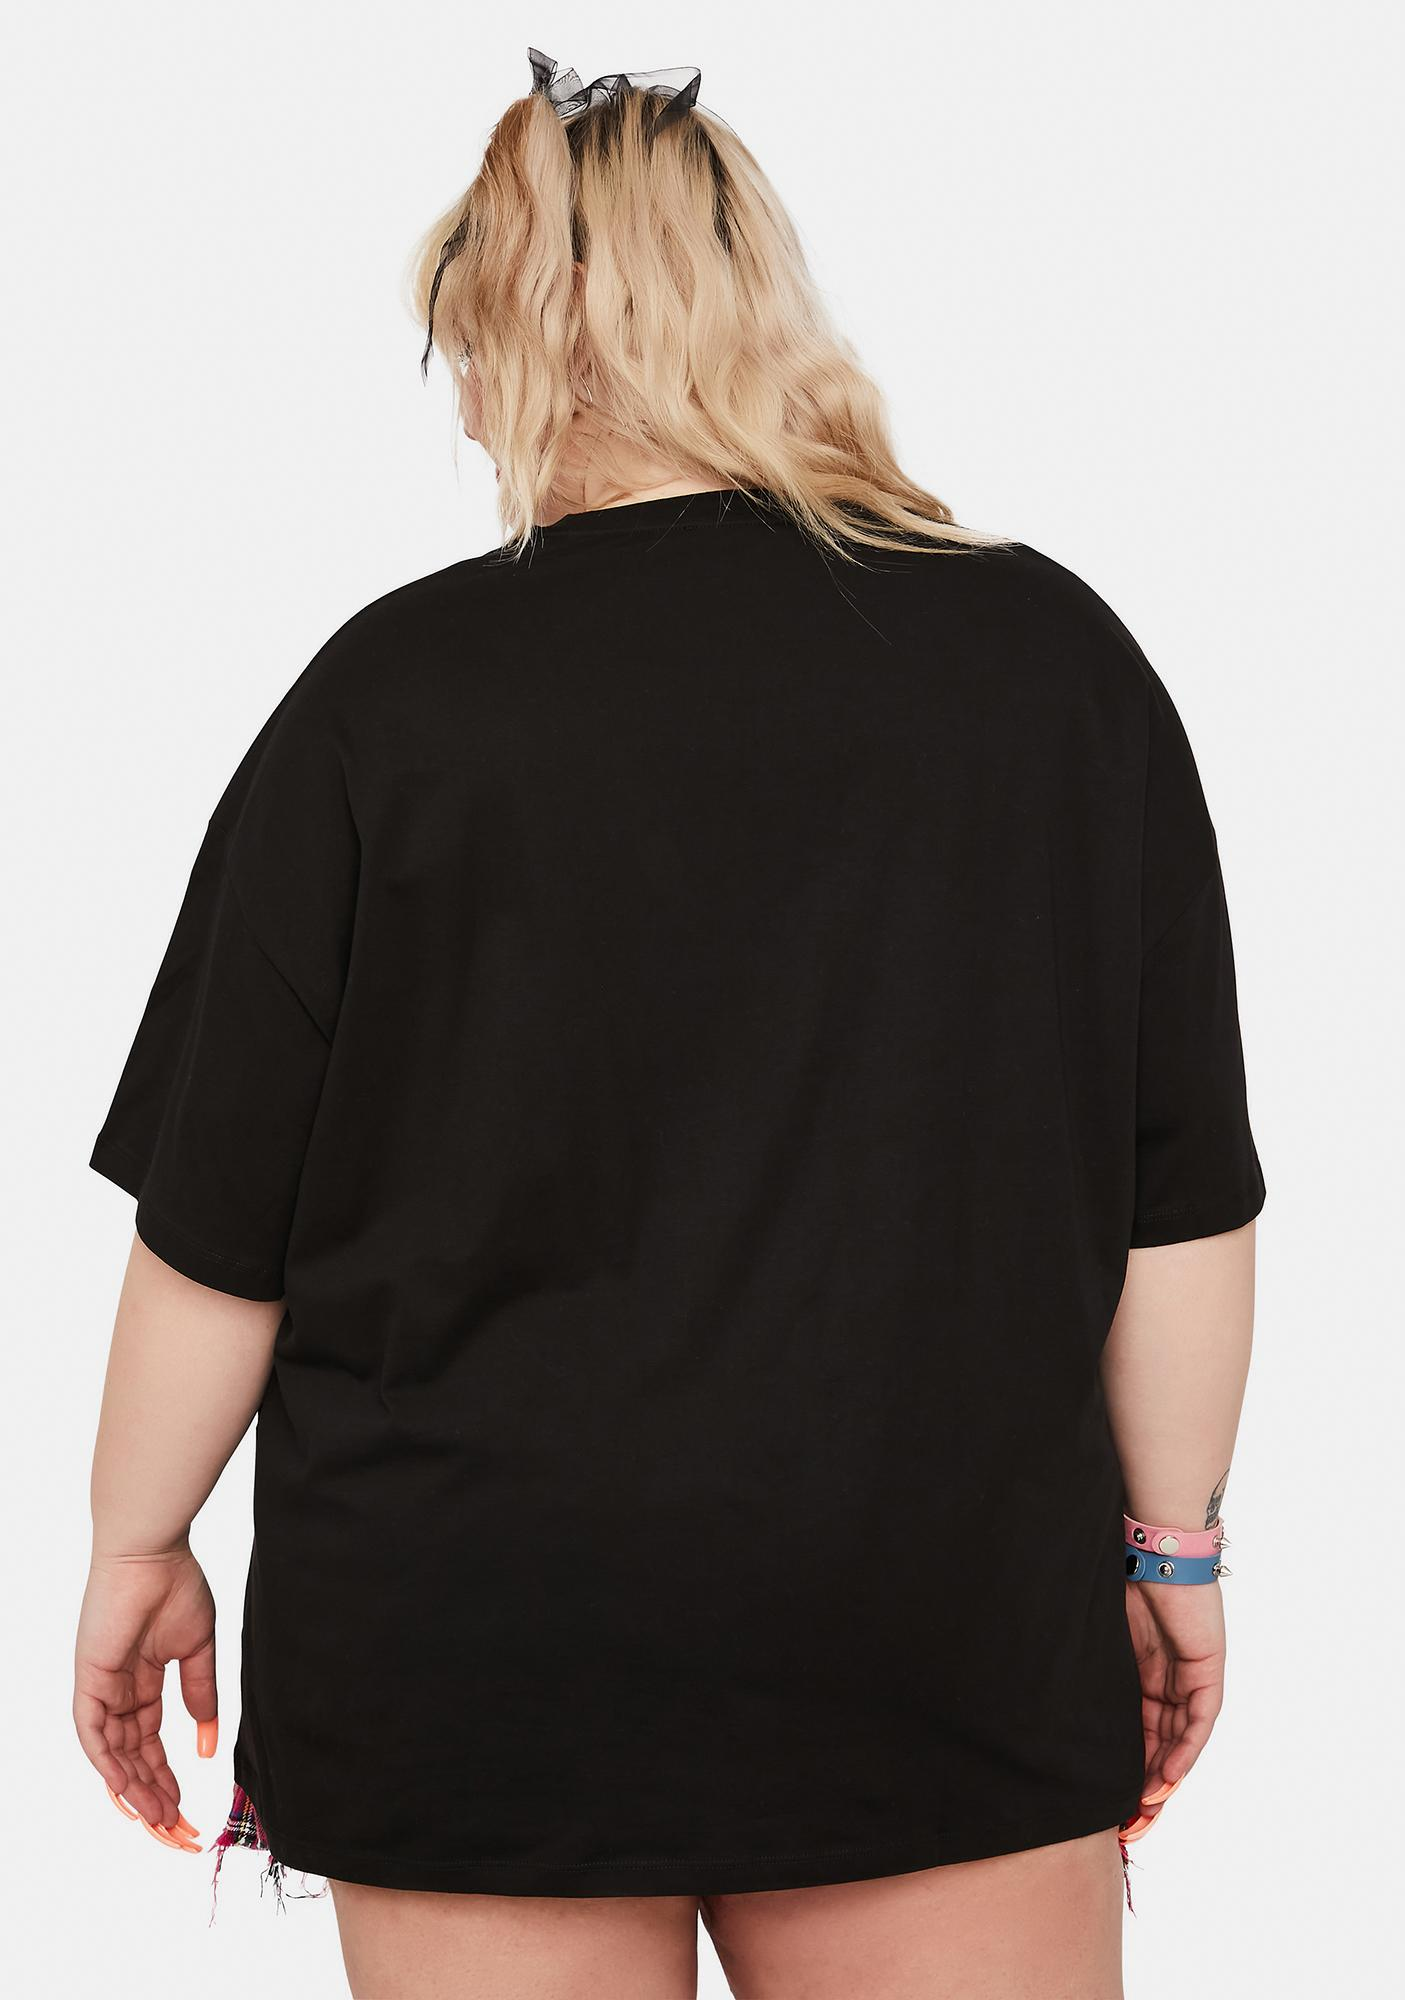 NEW GIRL ORDER Curve Kawaii T-shirt Dress